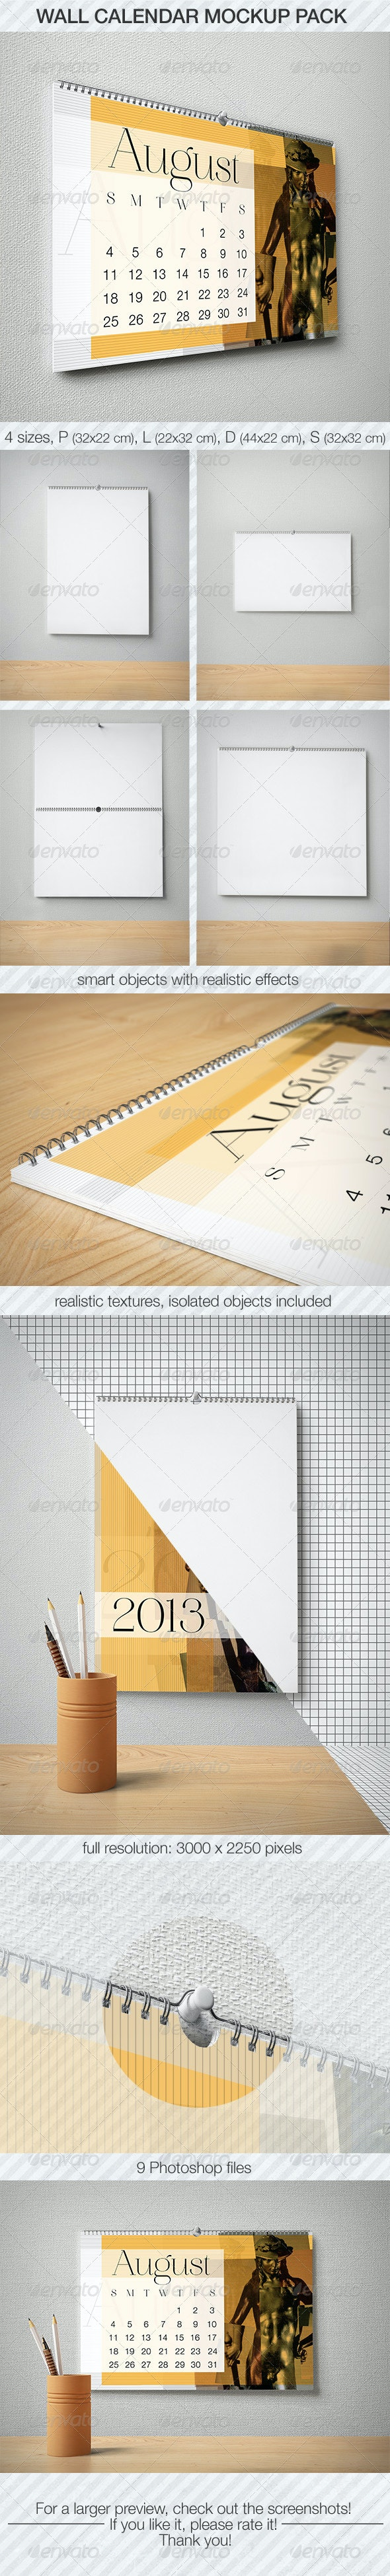 Wall Calendar Mockup Pack - Print Product Mock-Ups